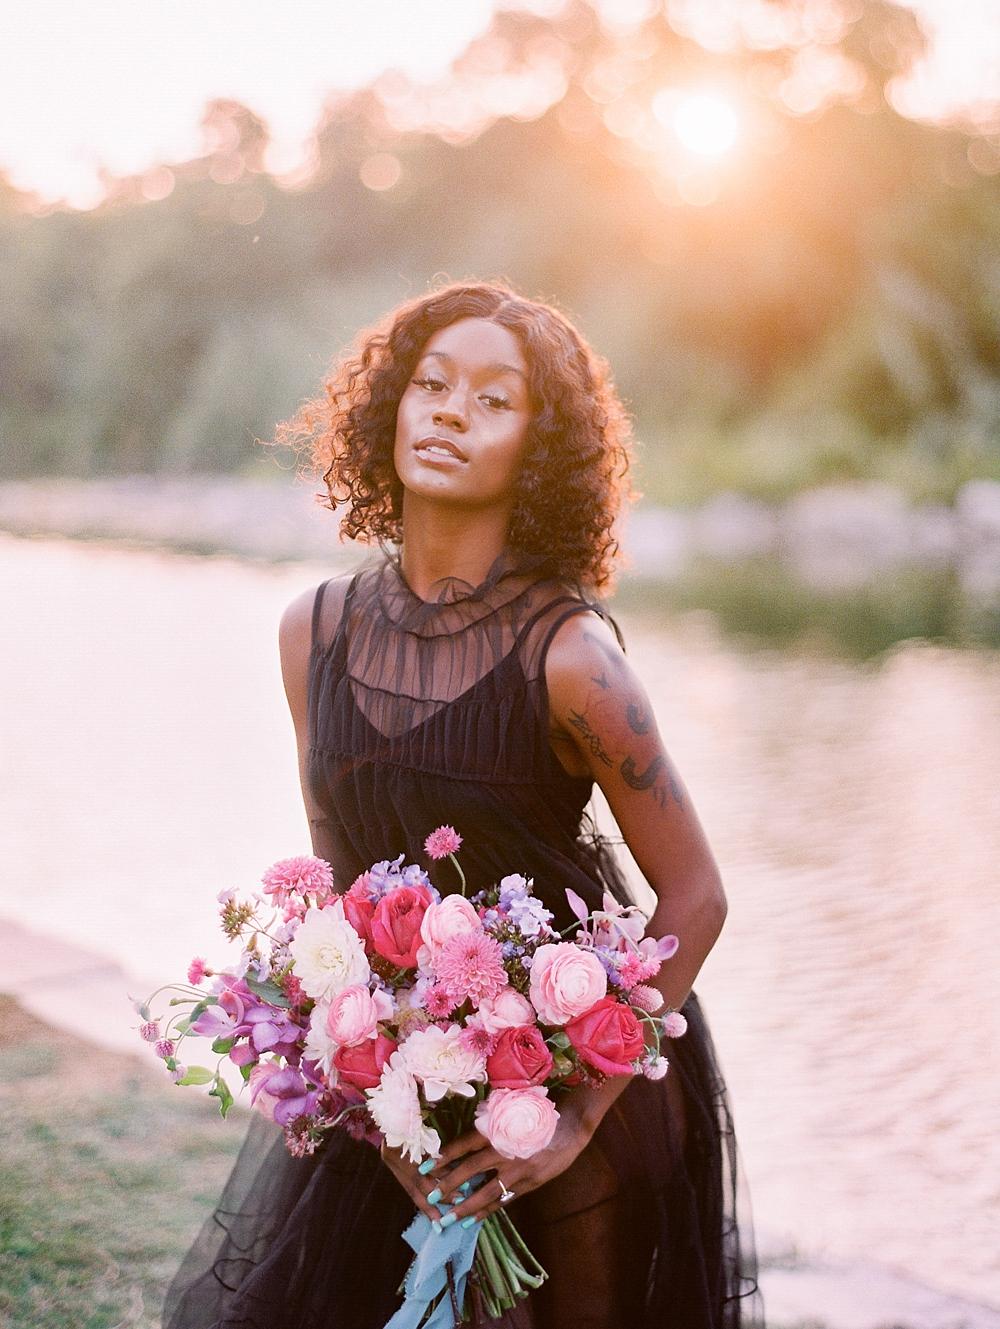 kristin-la-voie-photography-AUSTIN-wedding-BOUDOIR-photographer-61